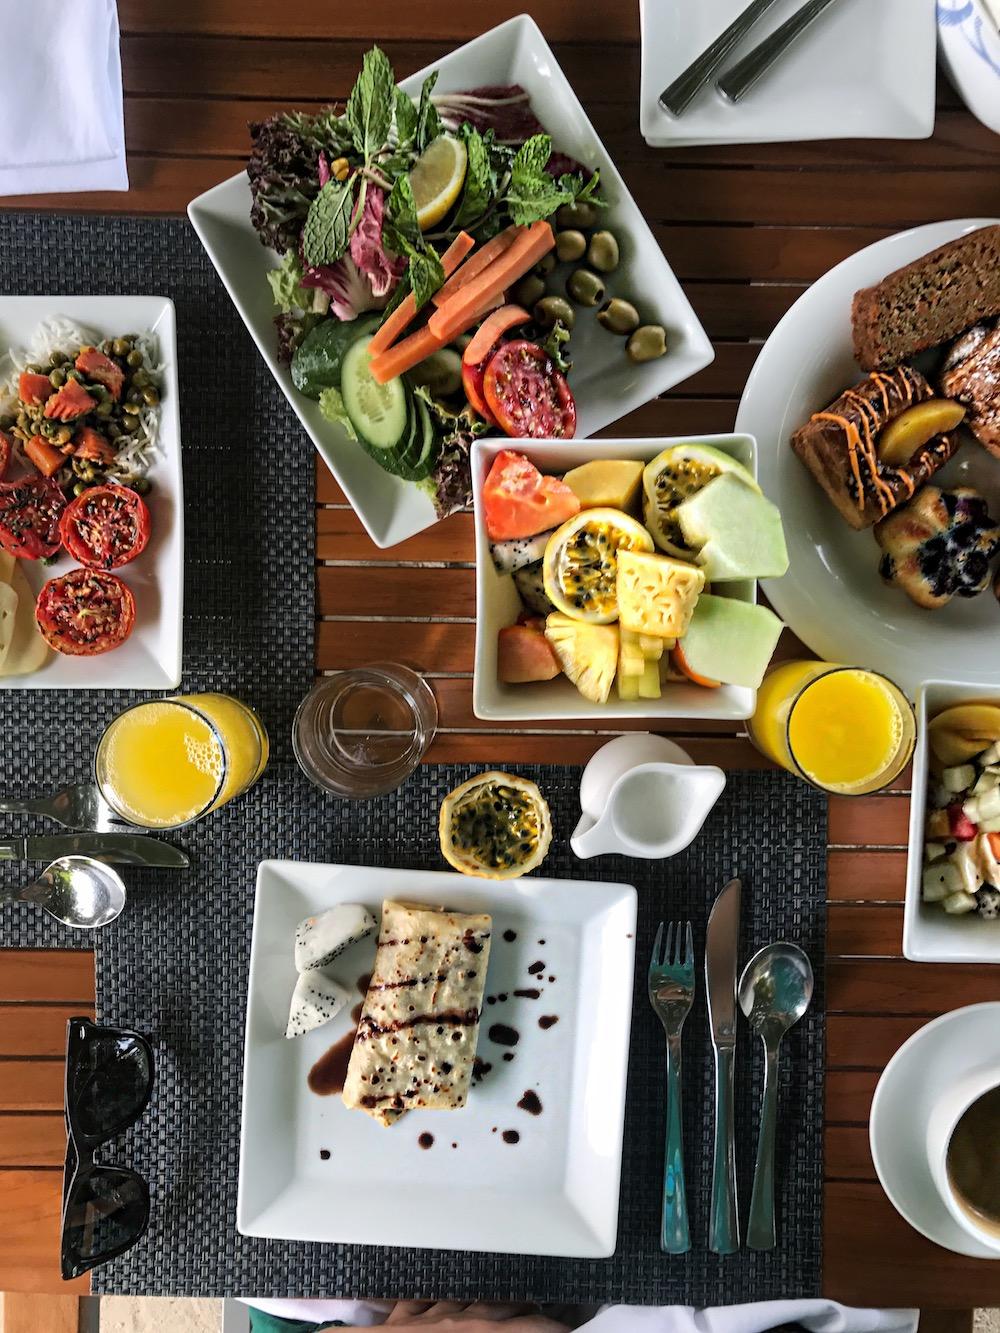 maldives-breakfast-alley-girl-fashion-travel-life-style-blog